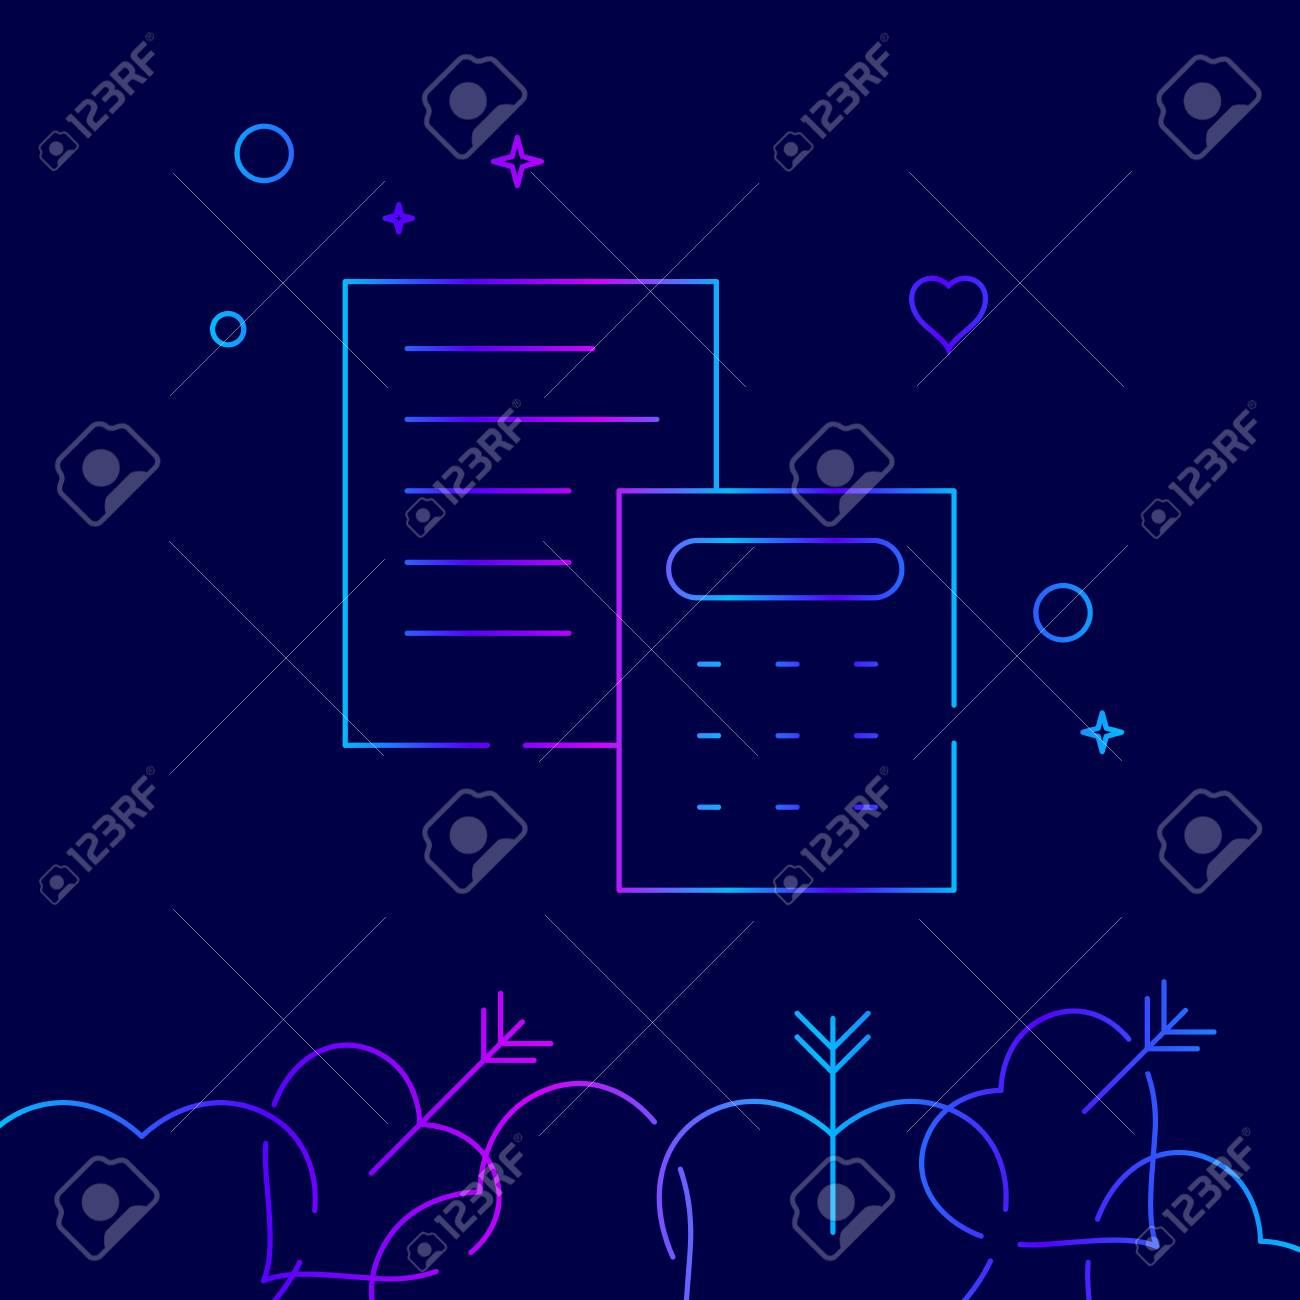 wedding estimate vector line icon symbol pictogram sign on